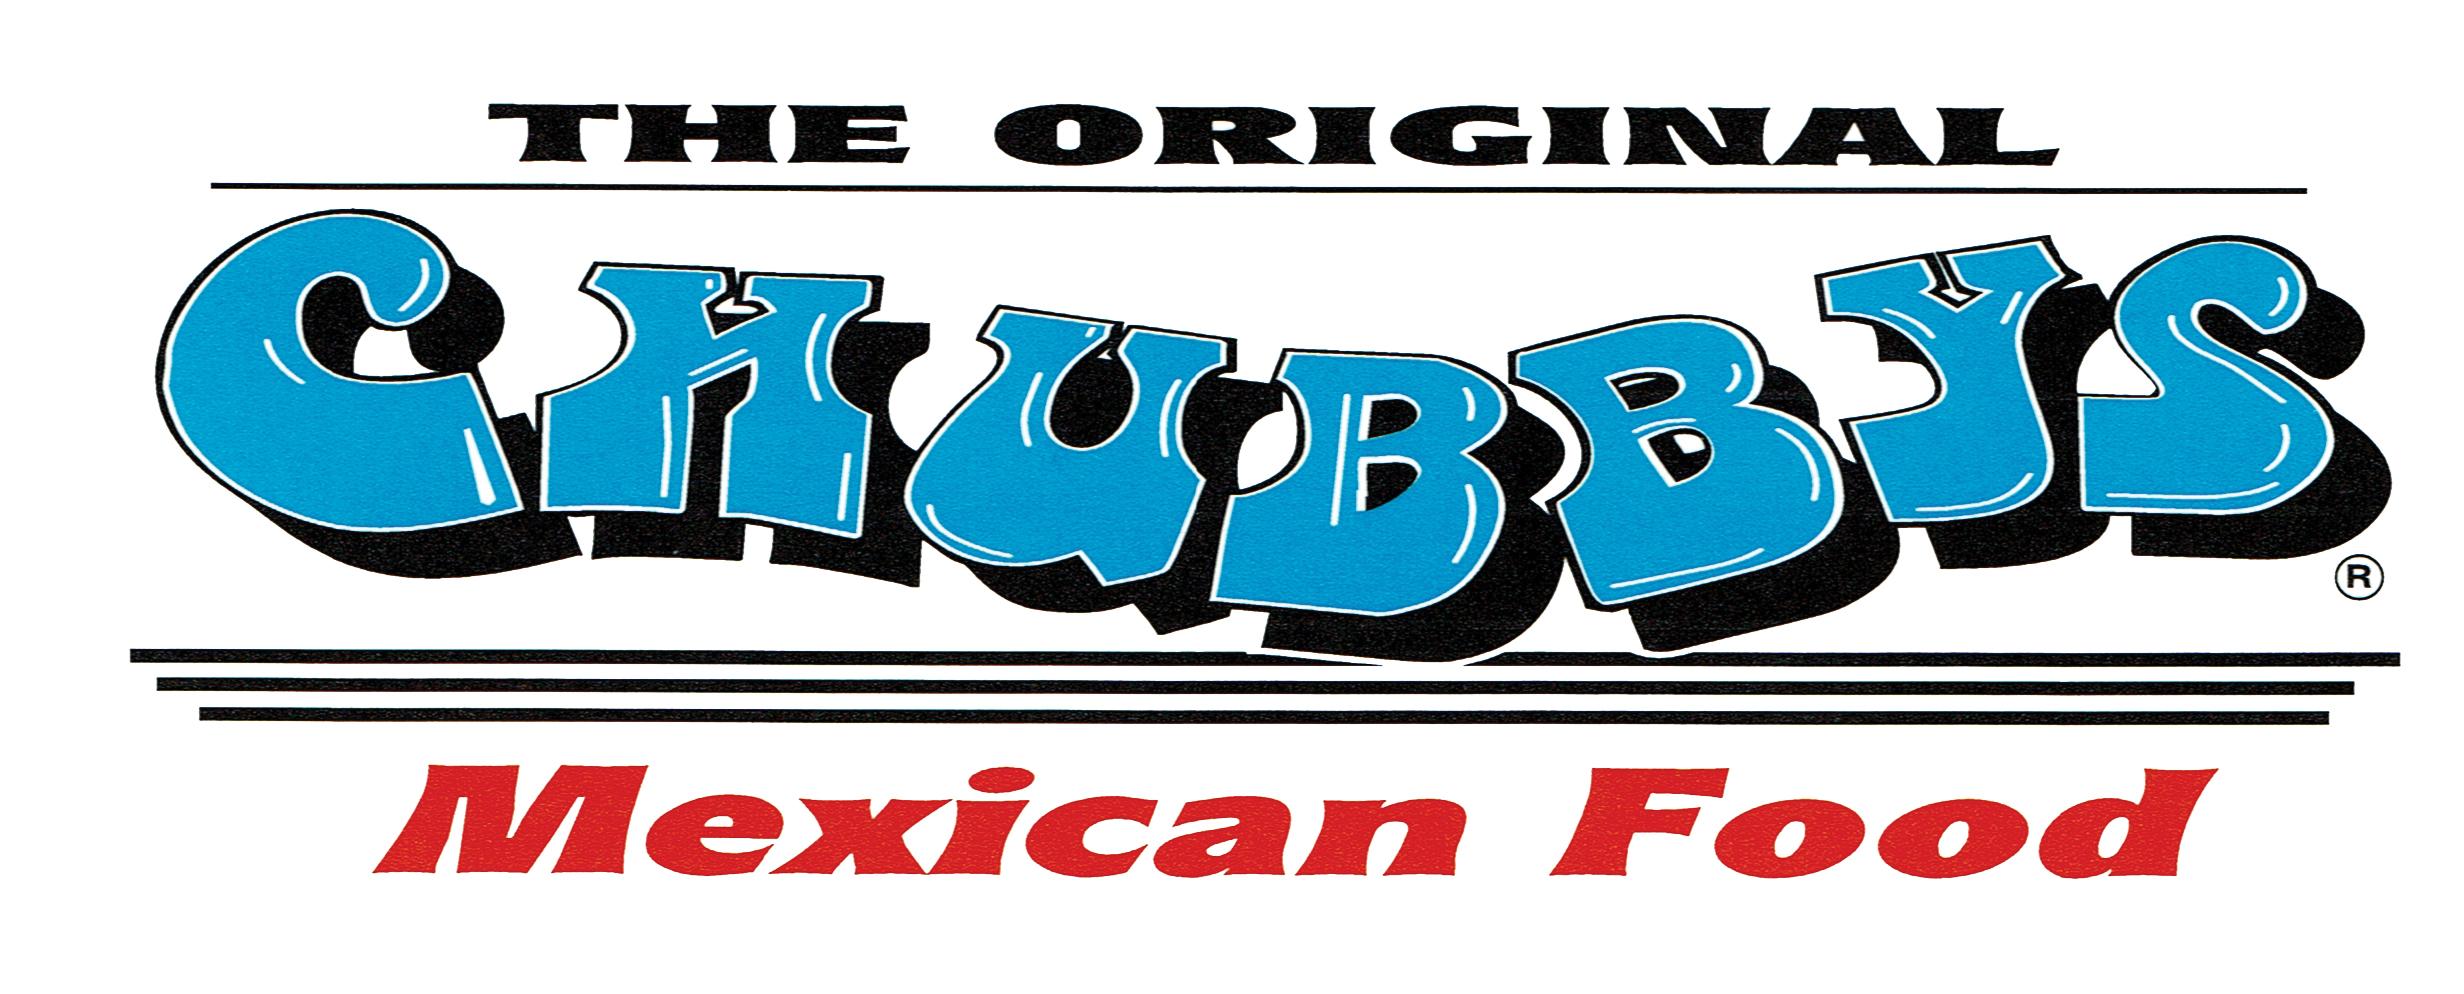 Chubbys Logo